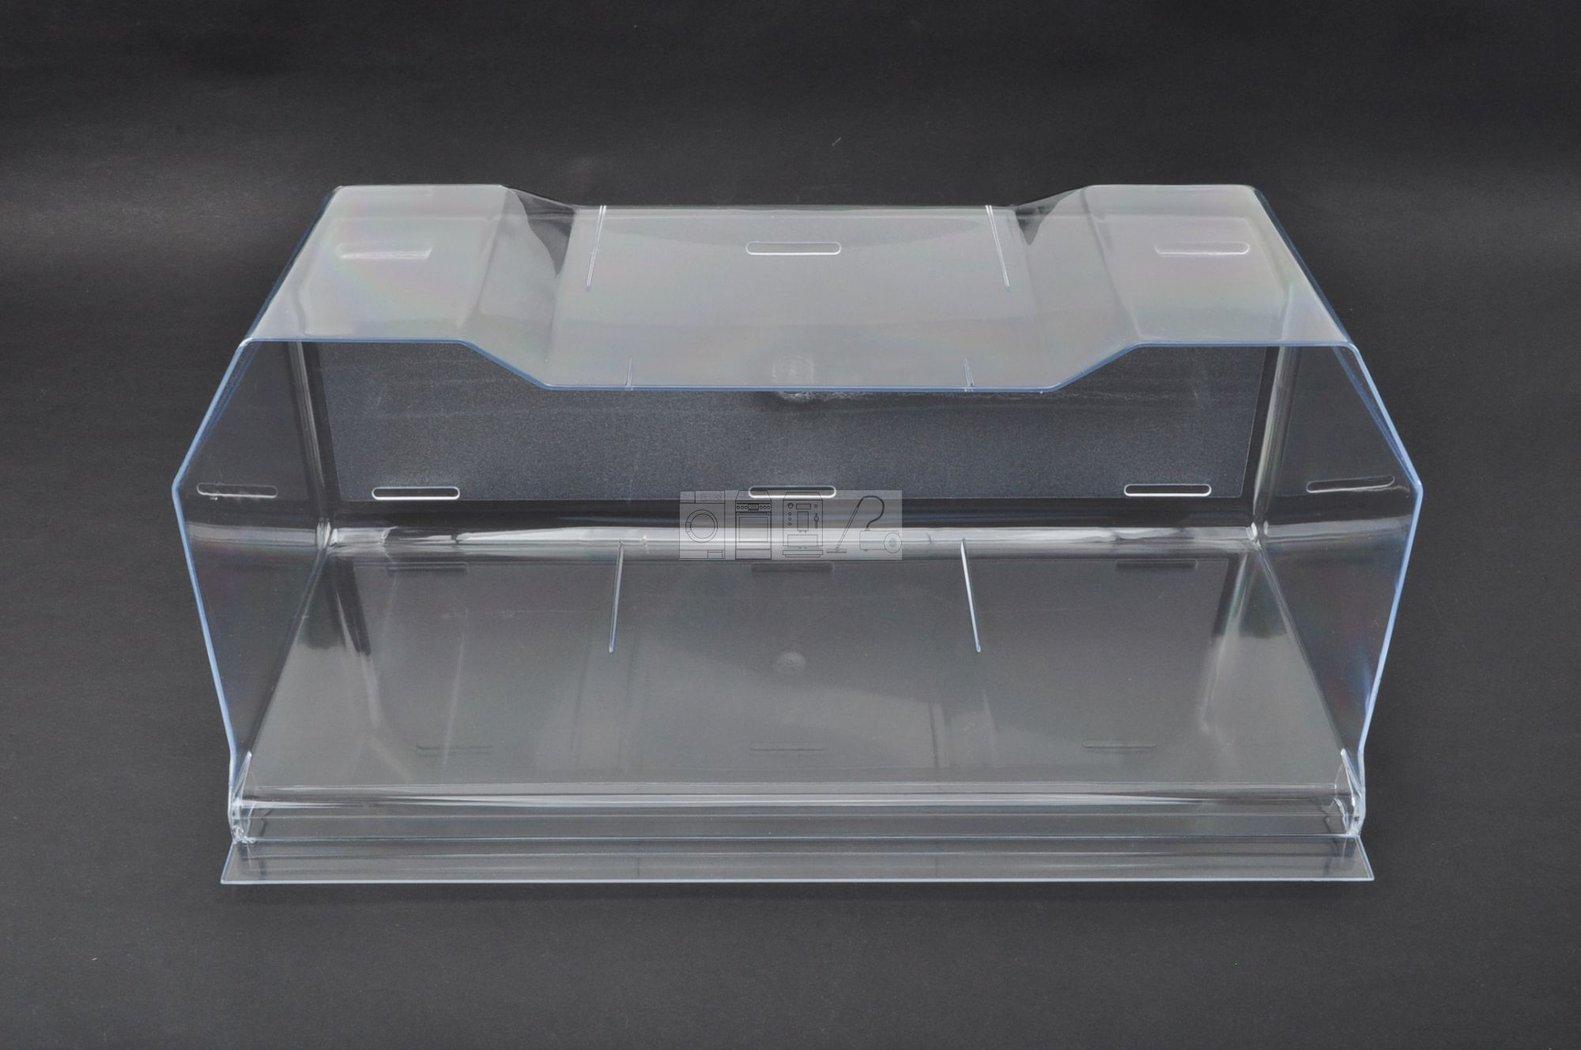 Aeg Santos Kühlschrank : Gemüse schale schublade kühlschrank aeg santo küppersbusch neff